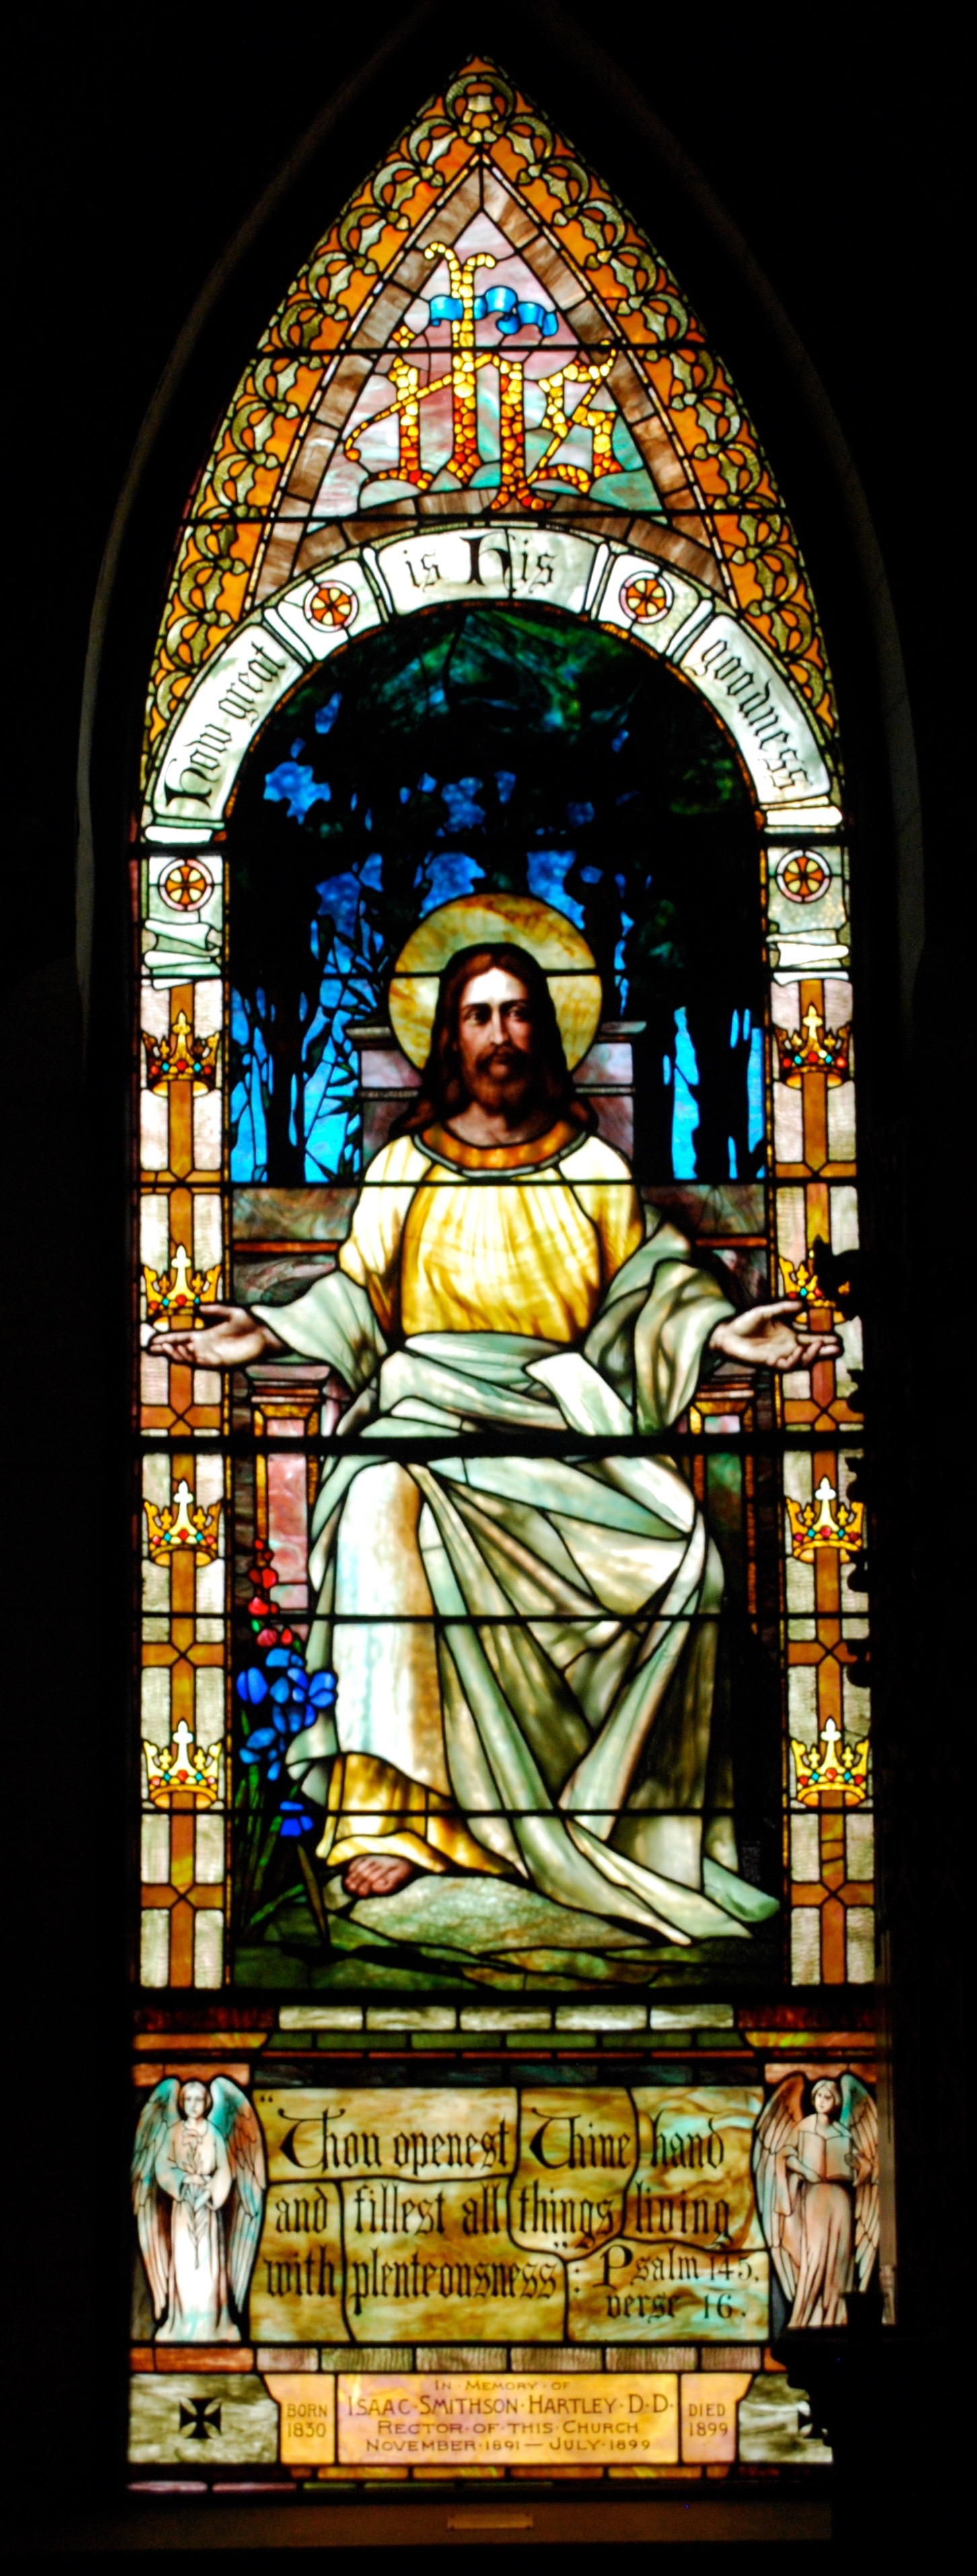 St. James Episcopal, Great Barrington, Ma. - Redding Baird Window